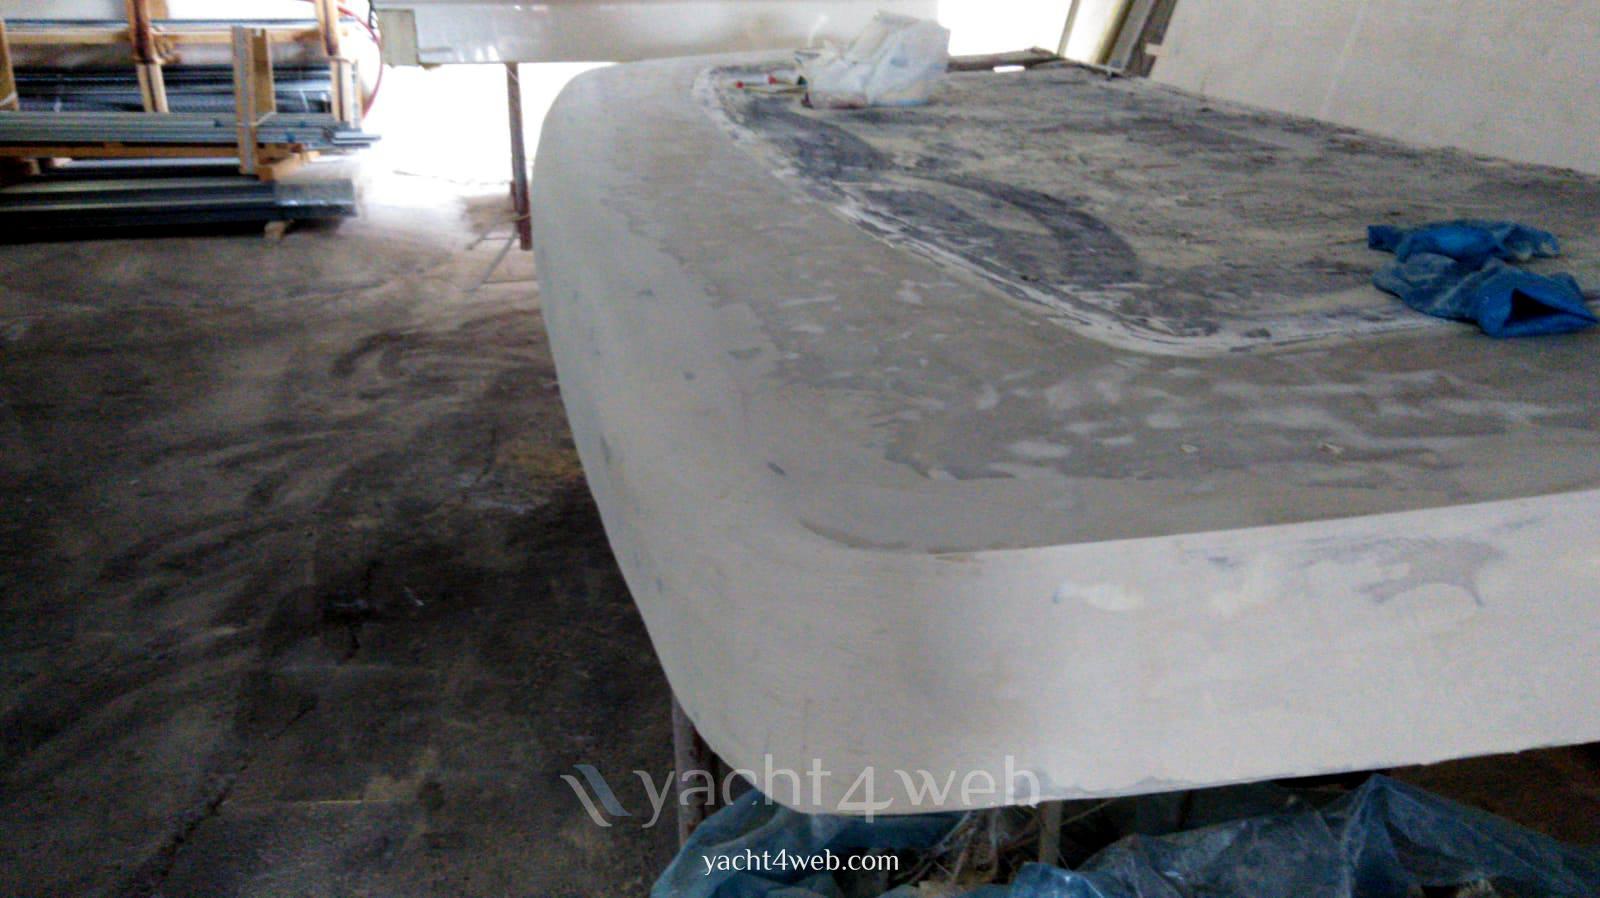 Conam Synthesi 40 Barca a motore usata in vendita